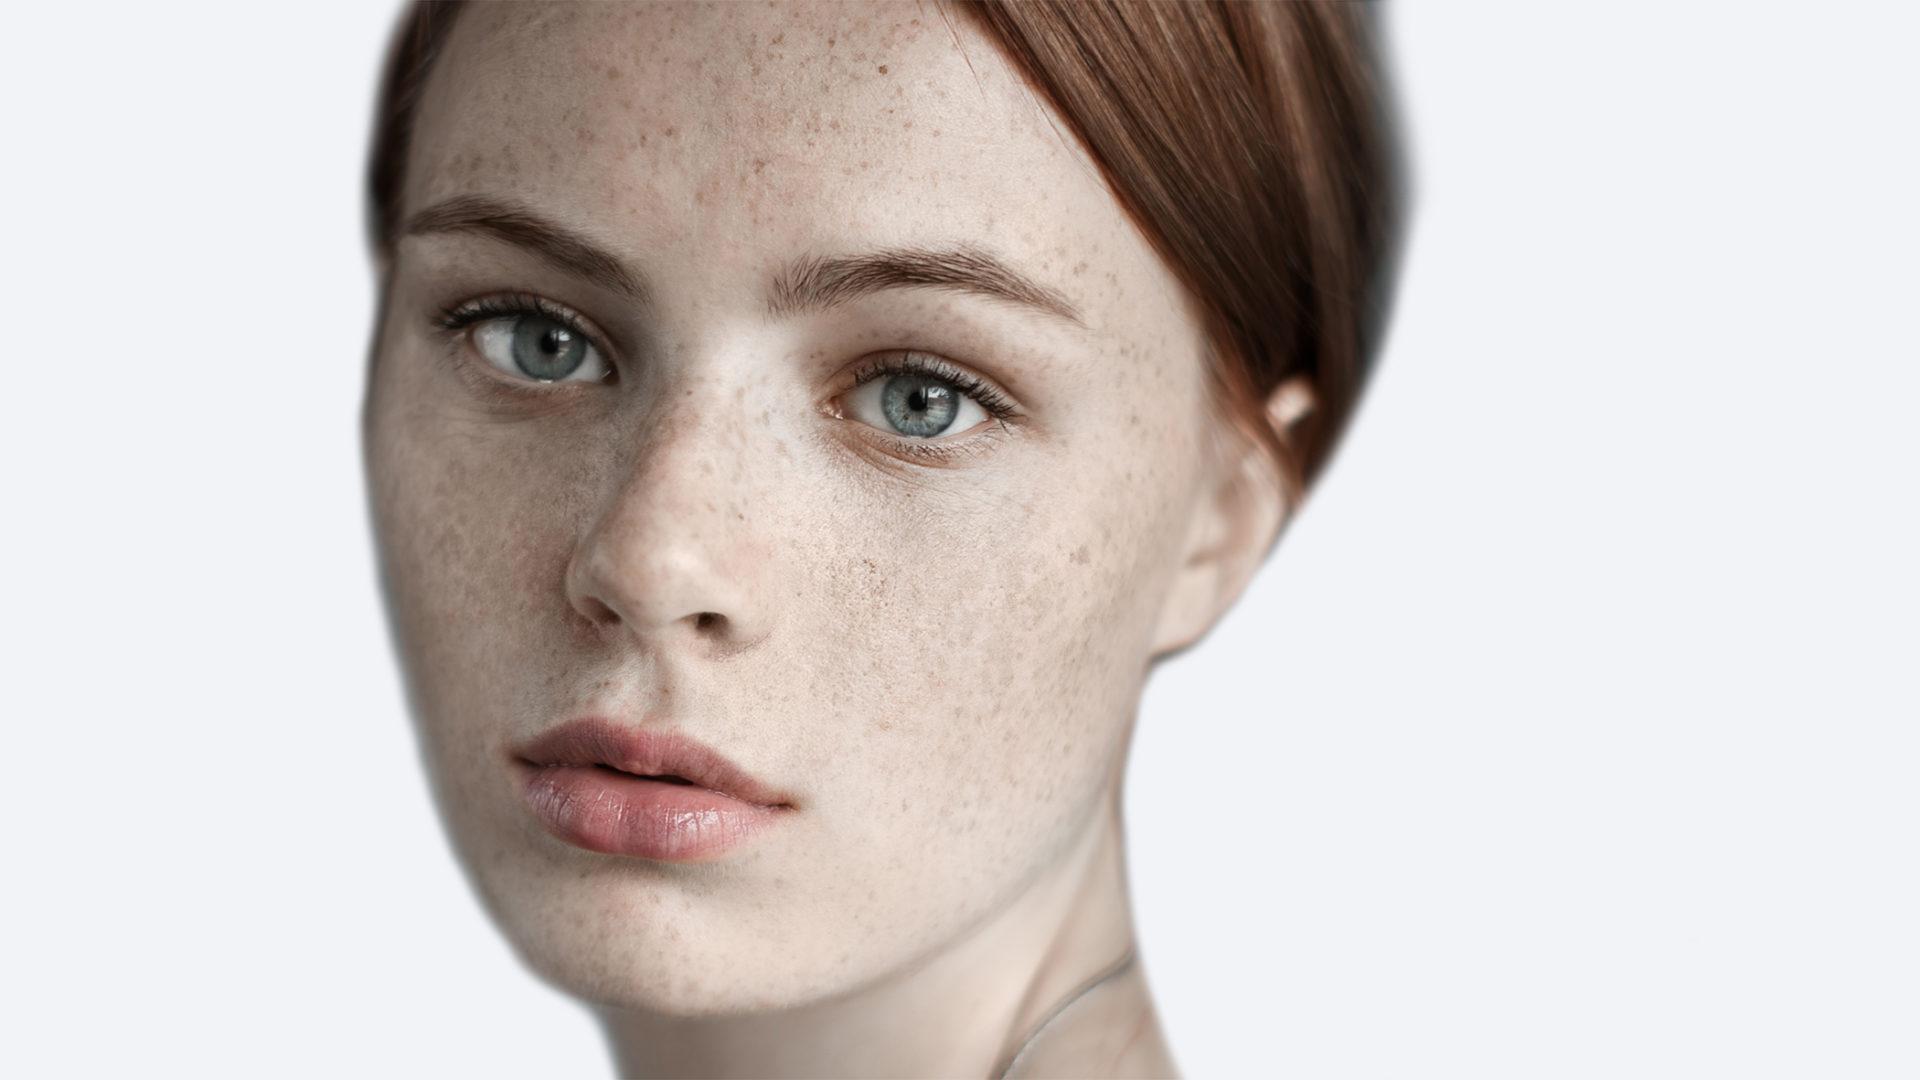 A pretty girl's face